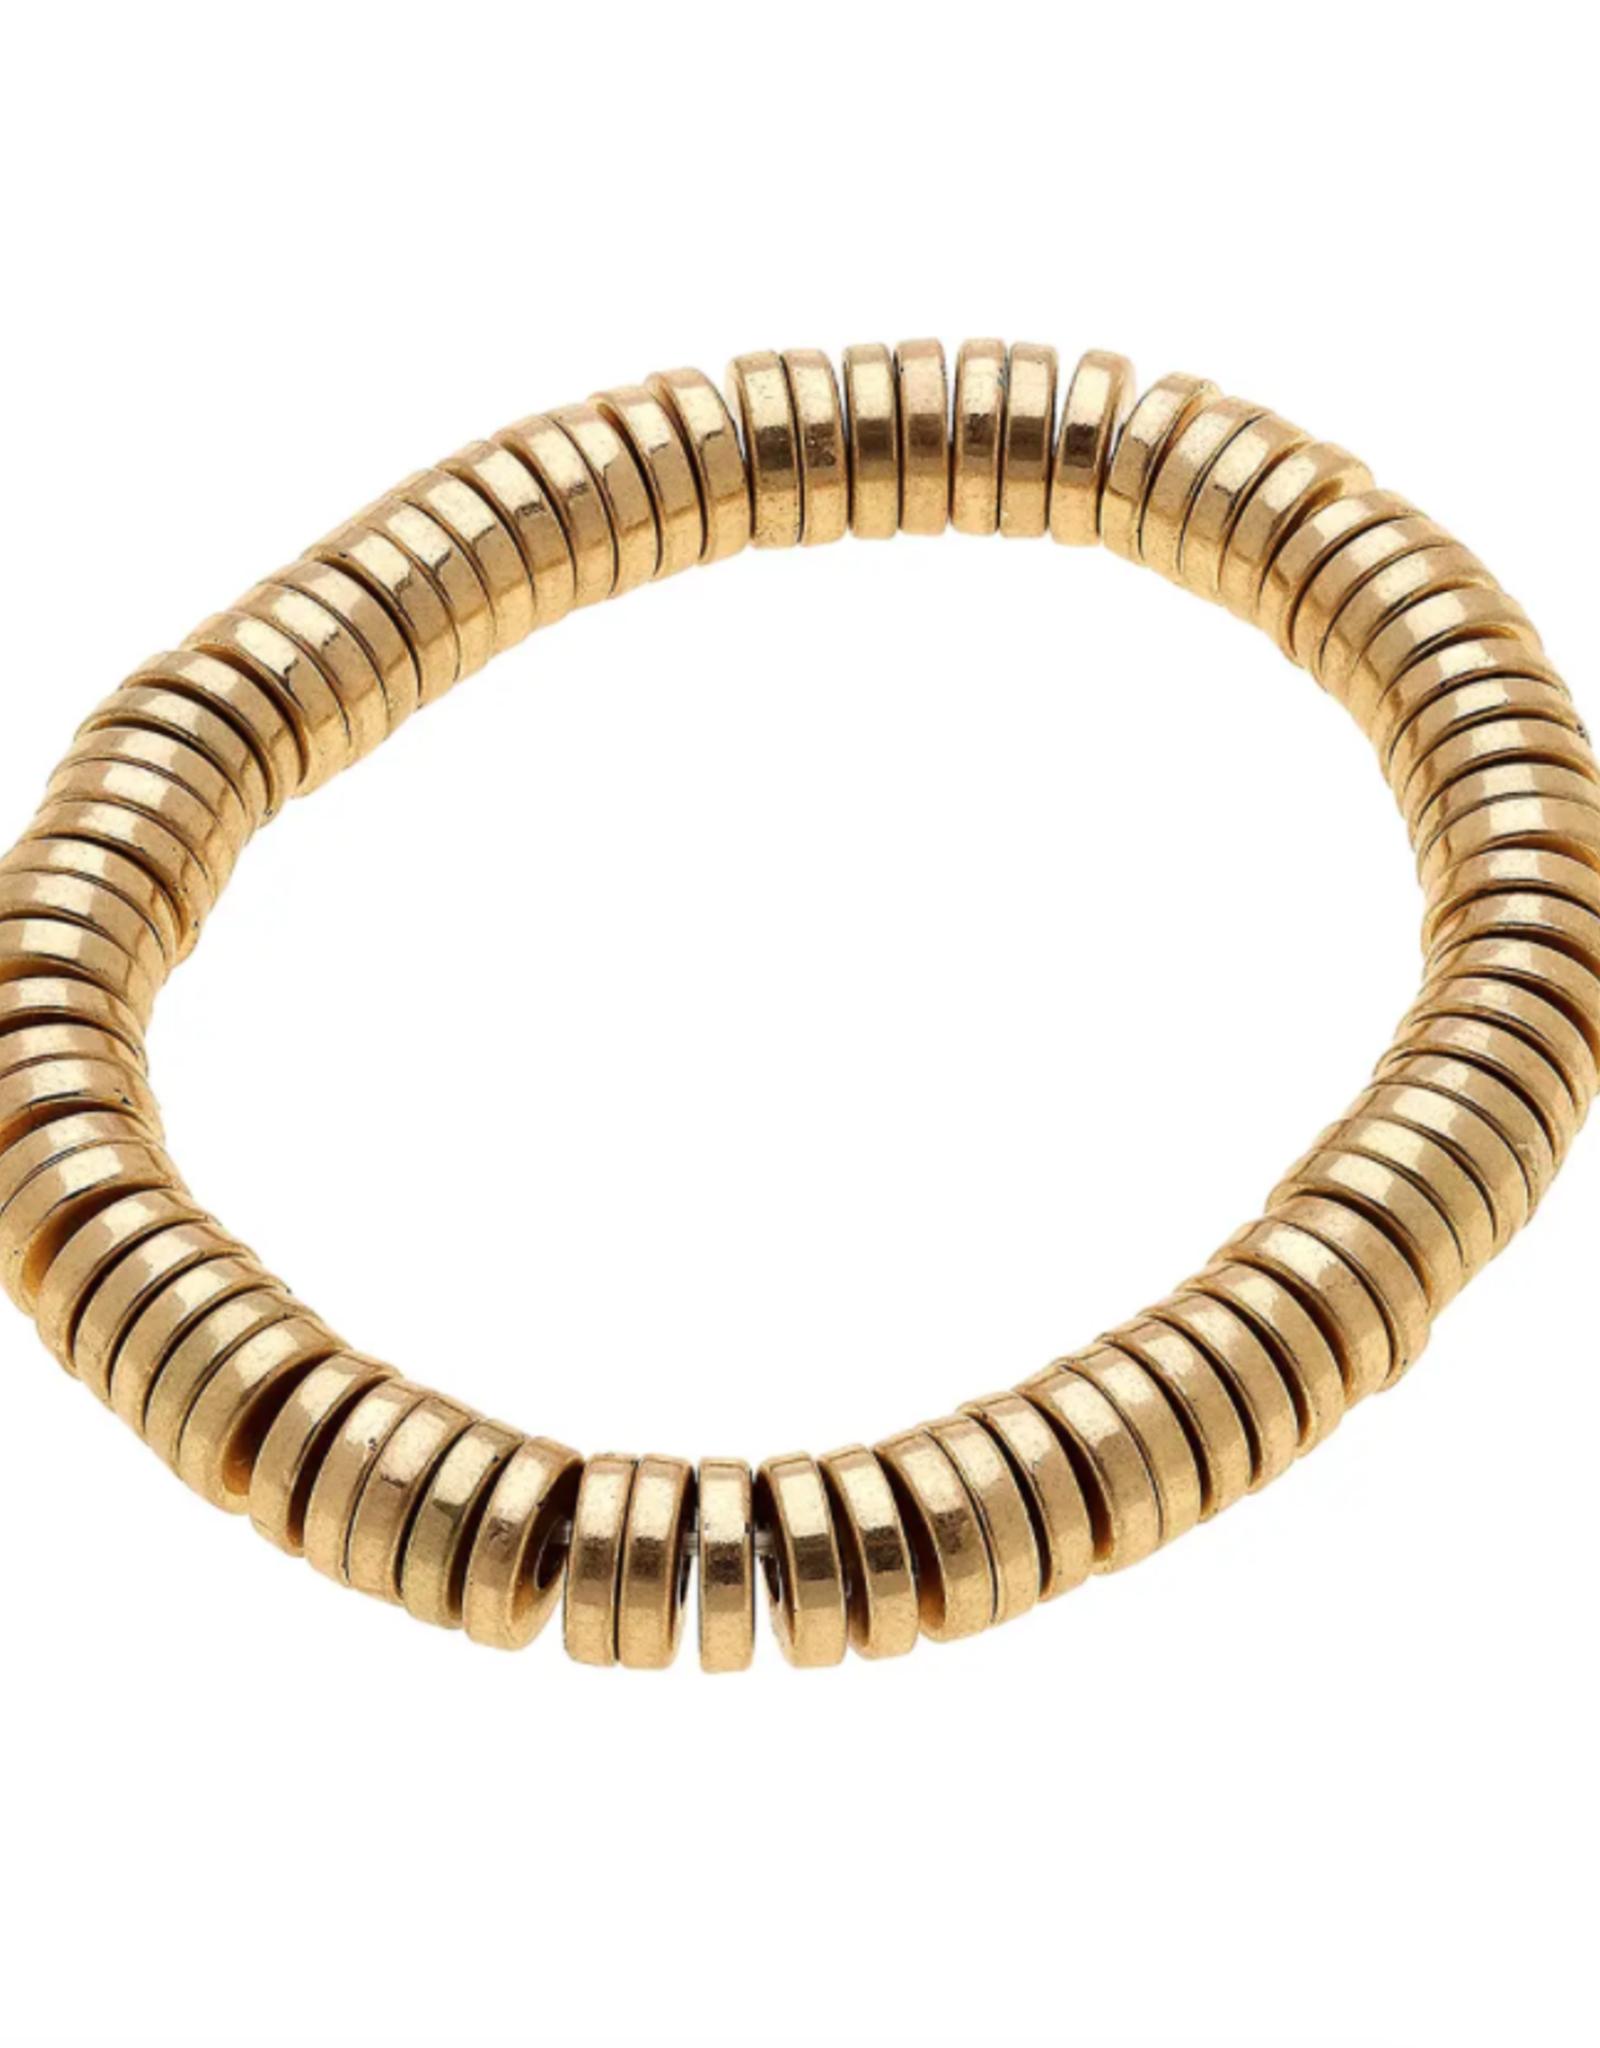 Emberly Bracelet - Worn Gold